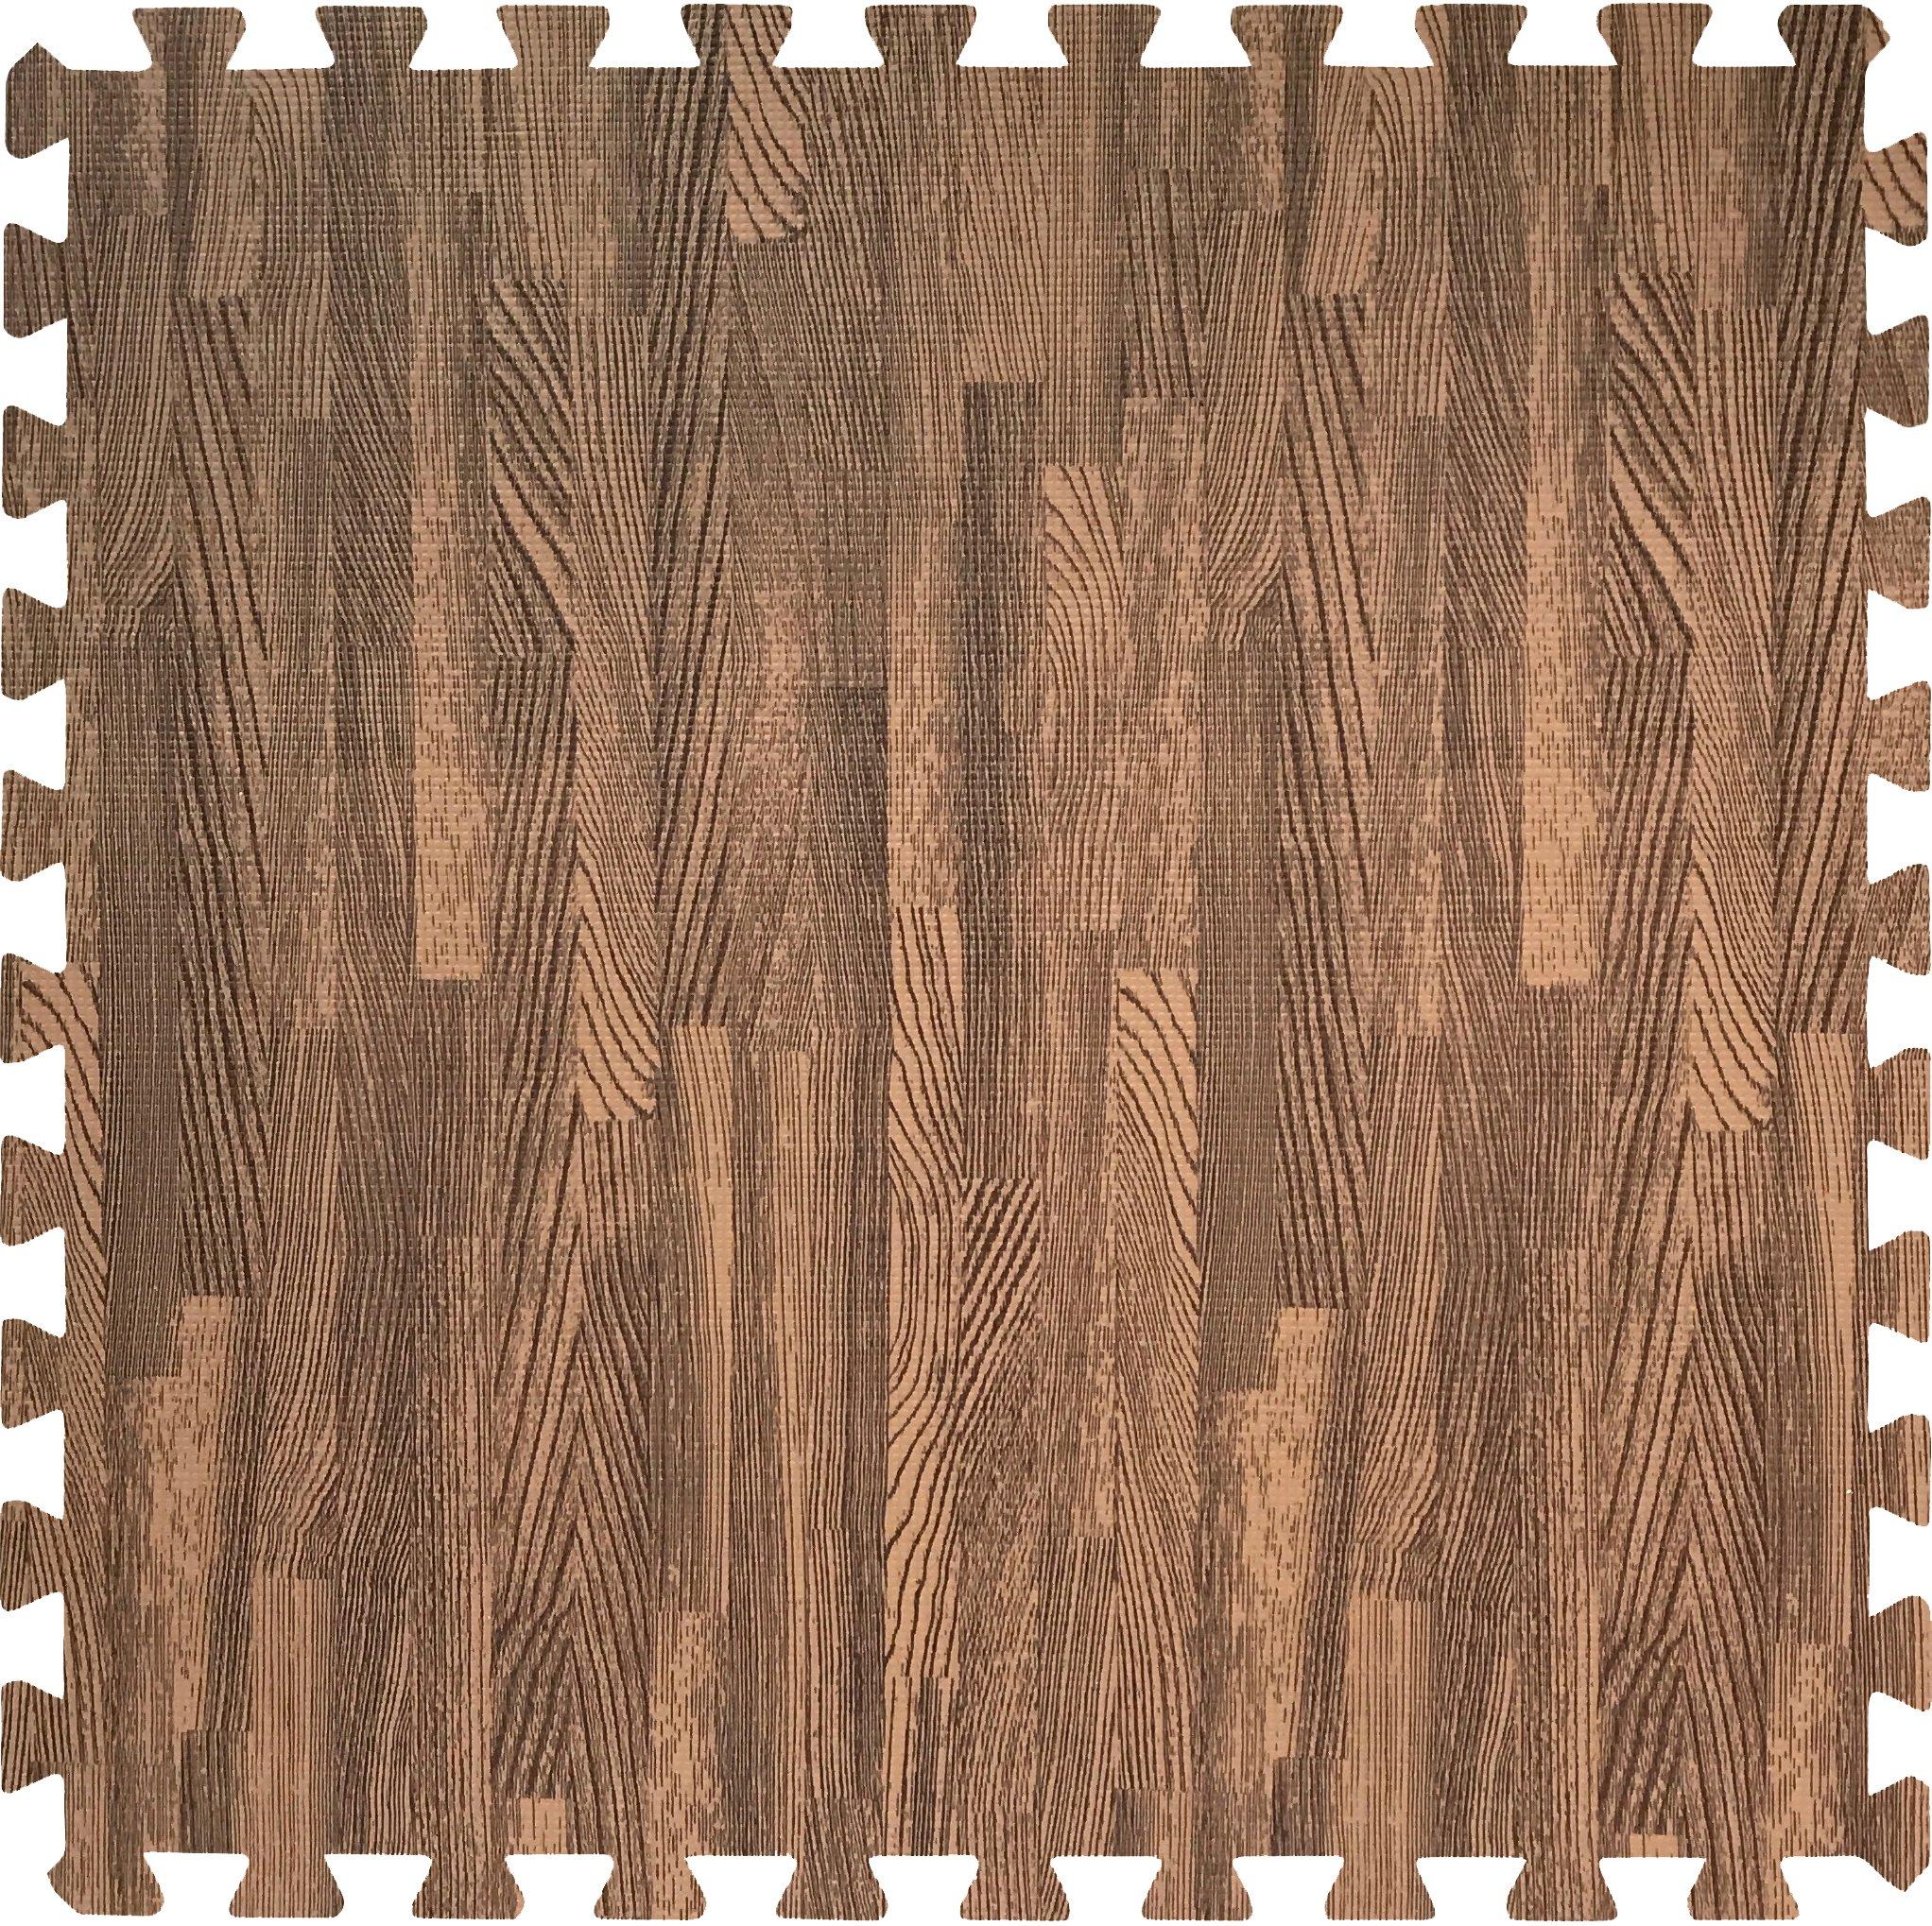 Sorbus Interlocking Floor Mat Print, Wood Grain - Dark (6-Piece) by Sorbus (Image #2)